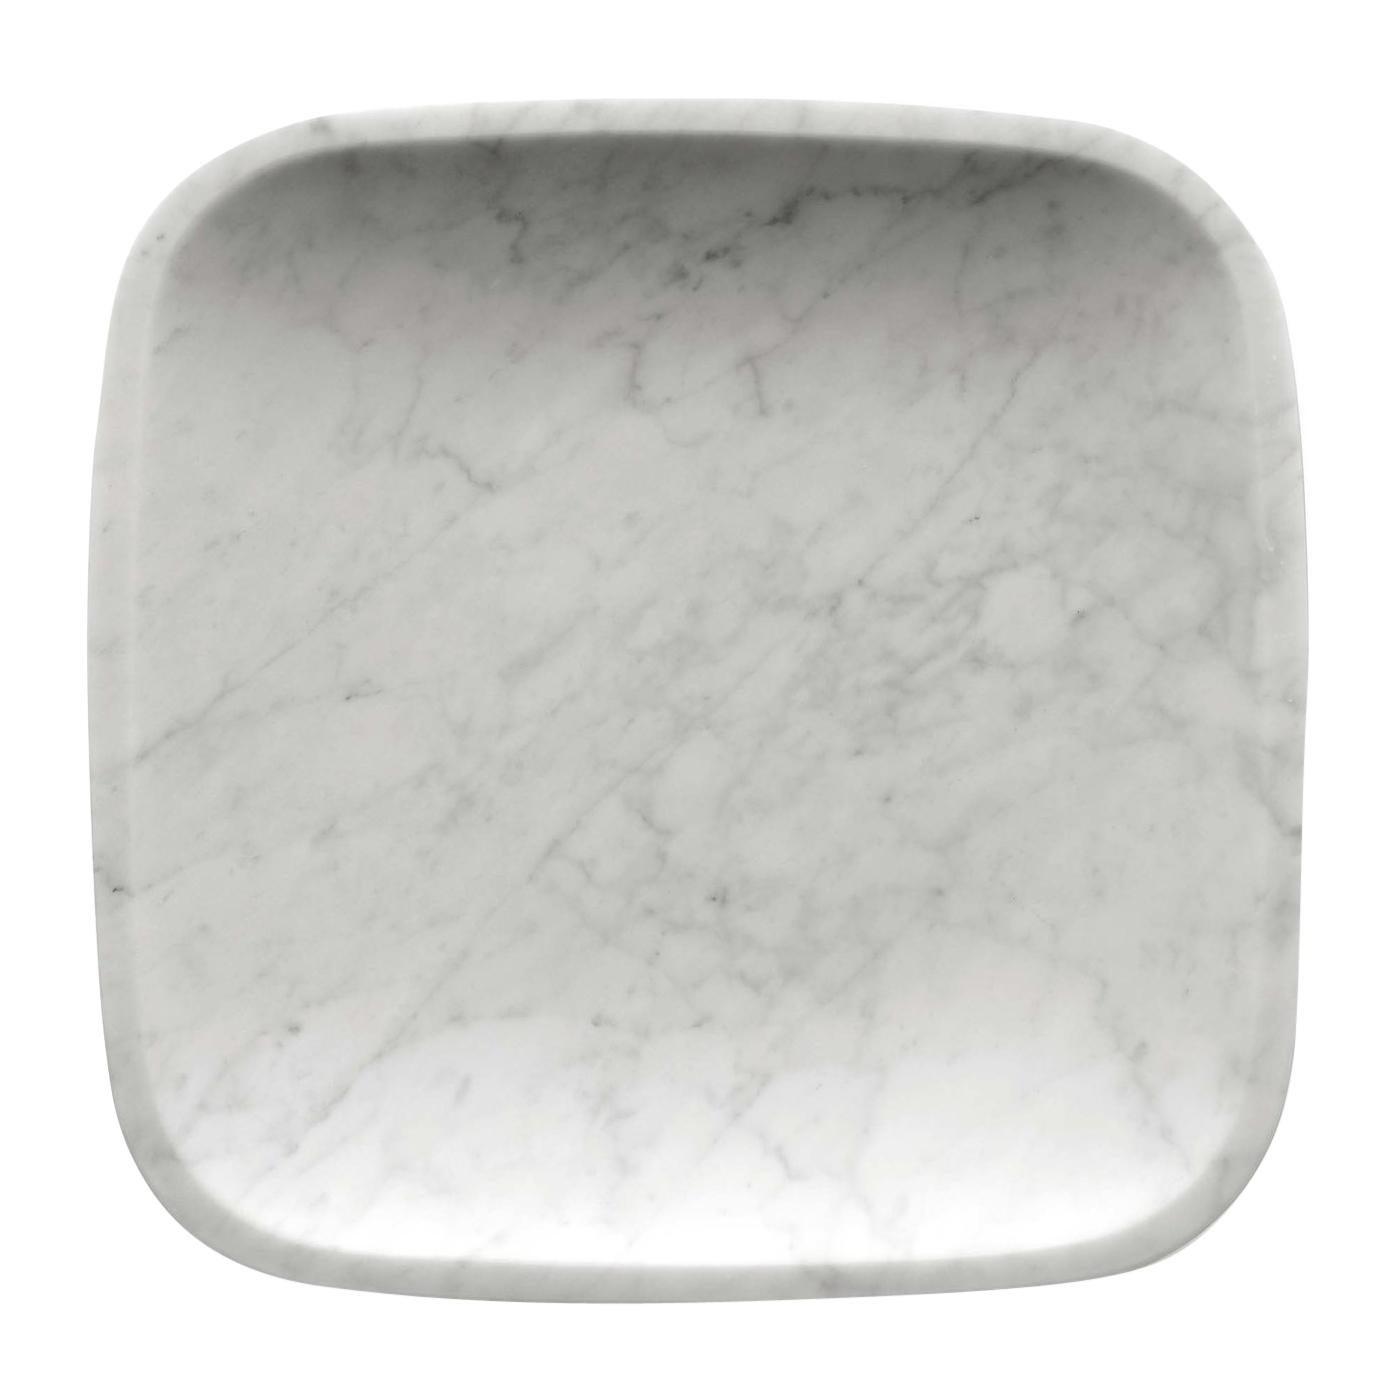 White Dina Fruit Bowl, Design James Irvine, 2011